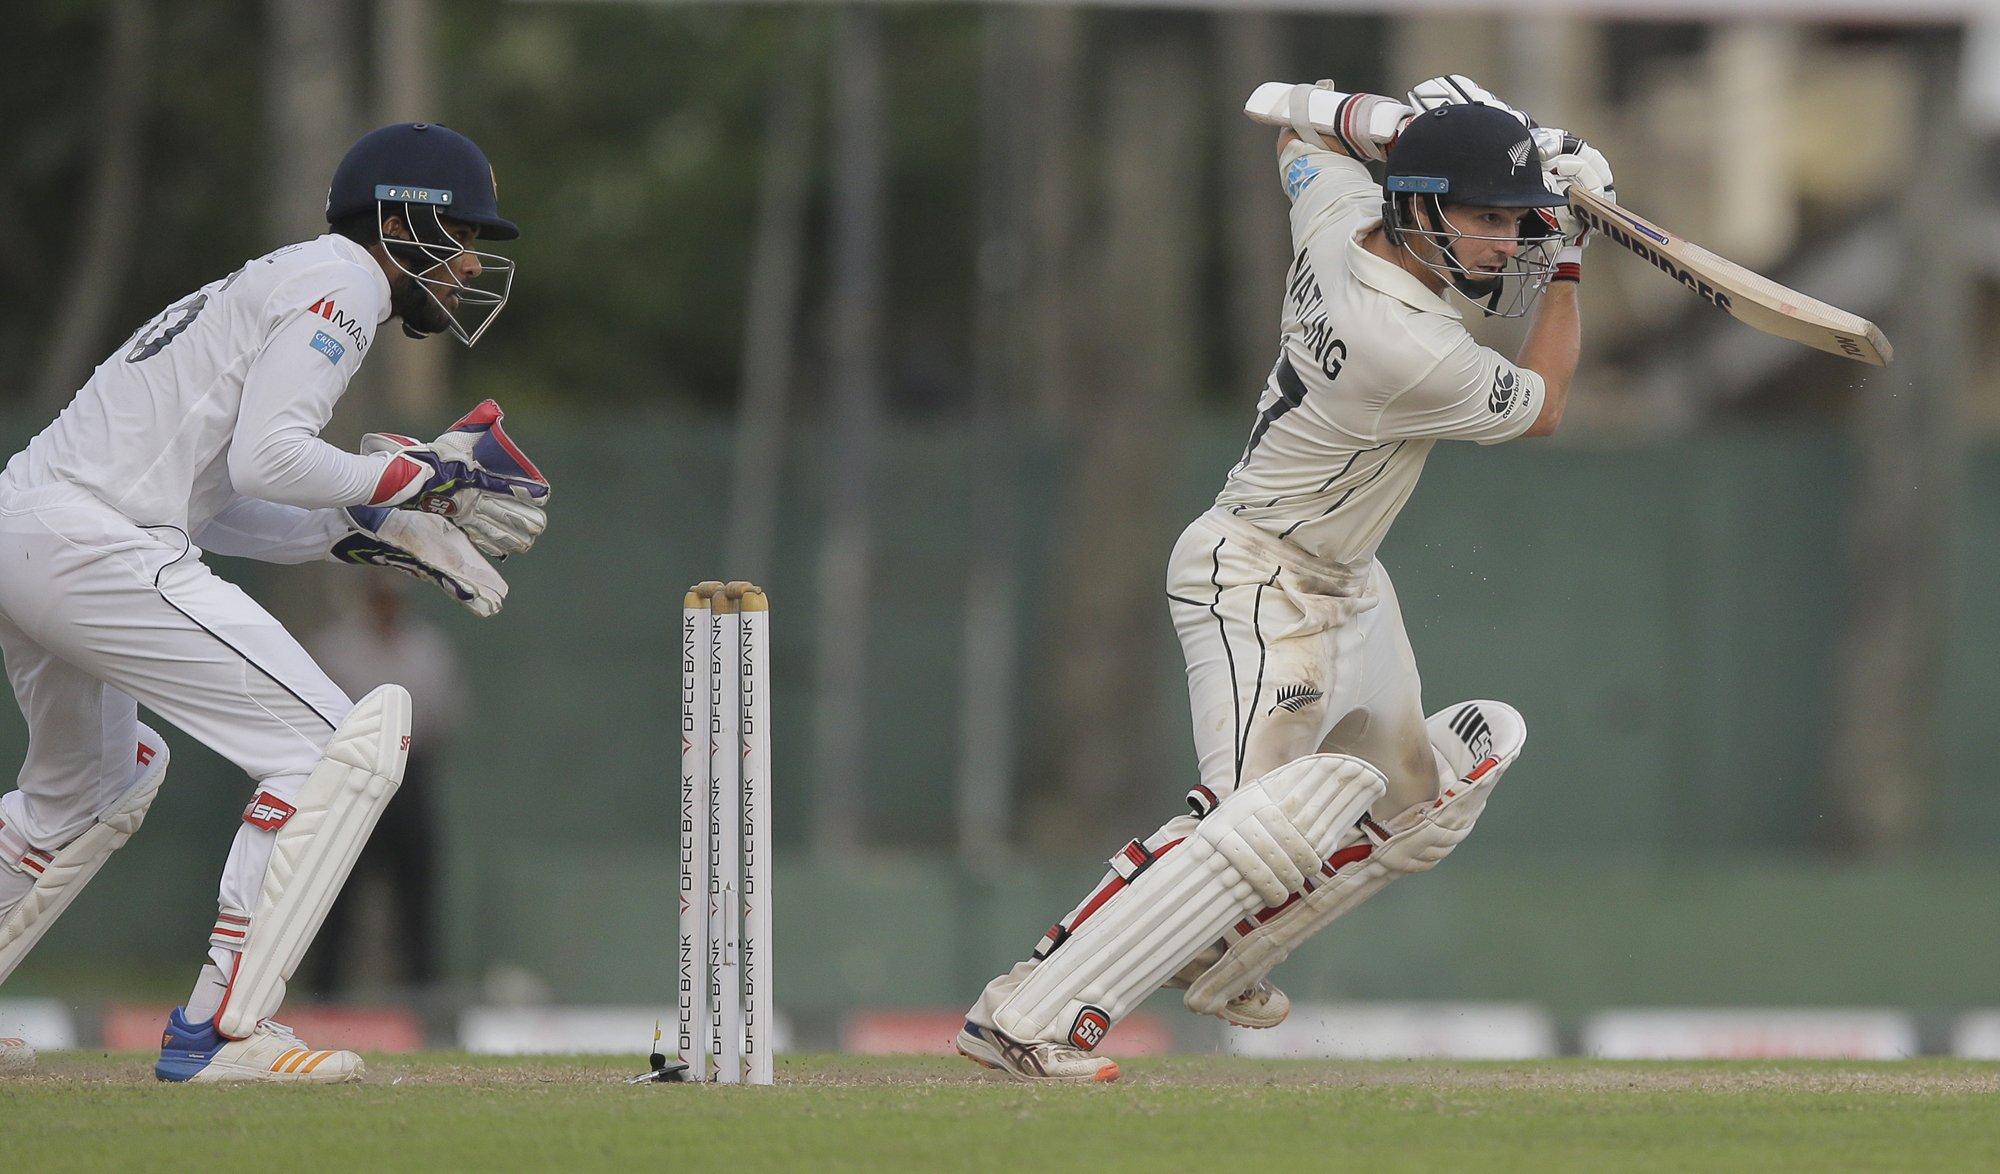 New Zealand take 138-run lead in 2nd test vs. Sri Lanka